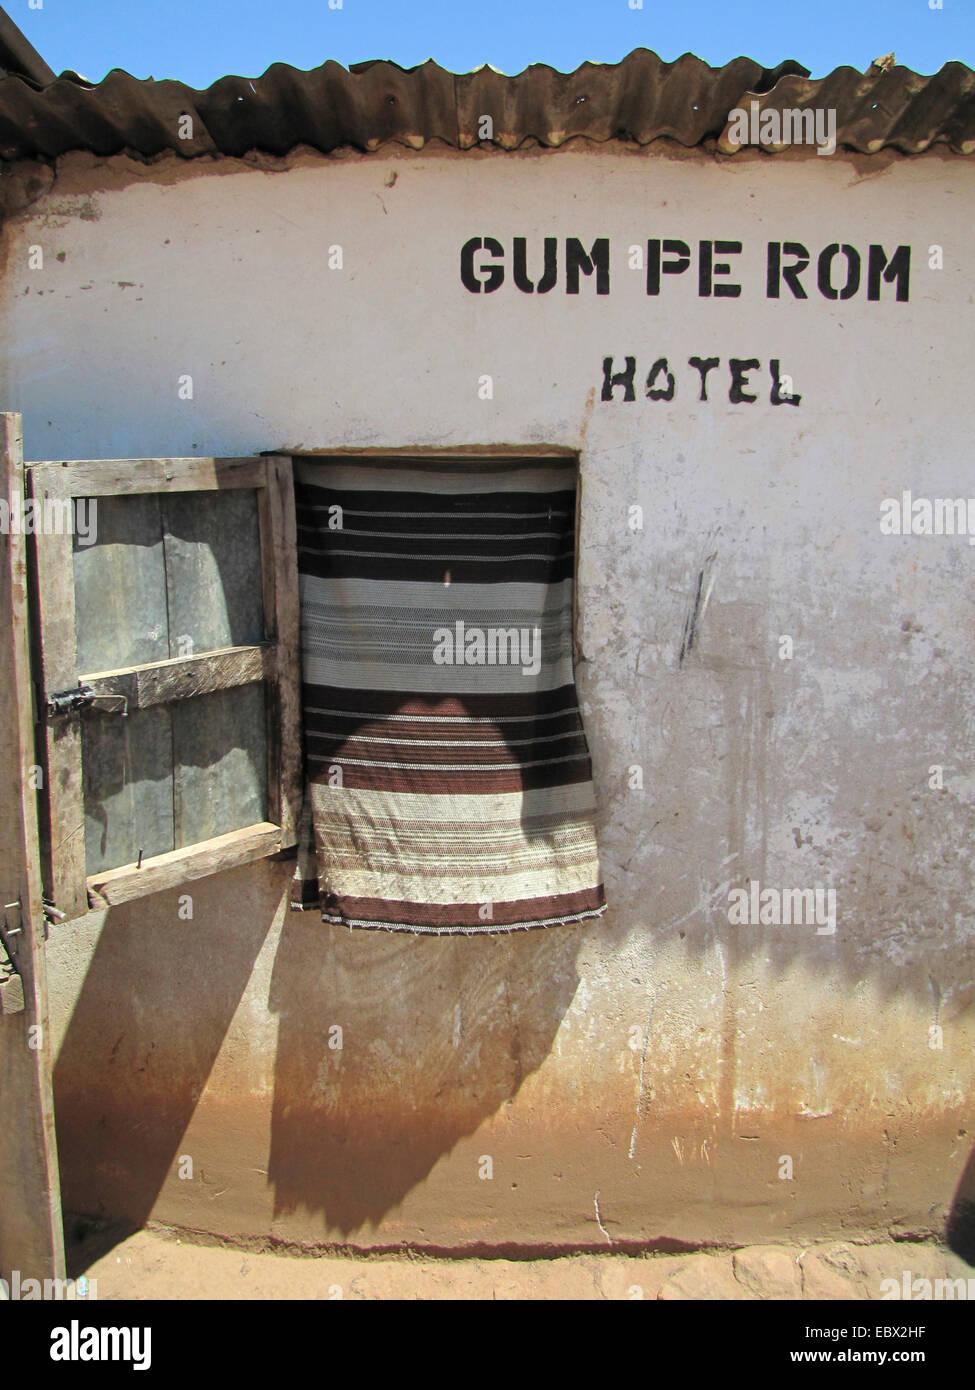 simple hotel at a refugee camp for internally displaced people in northern Uganda around Gulu, Uganda, Gulu - Stock Image